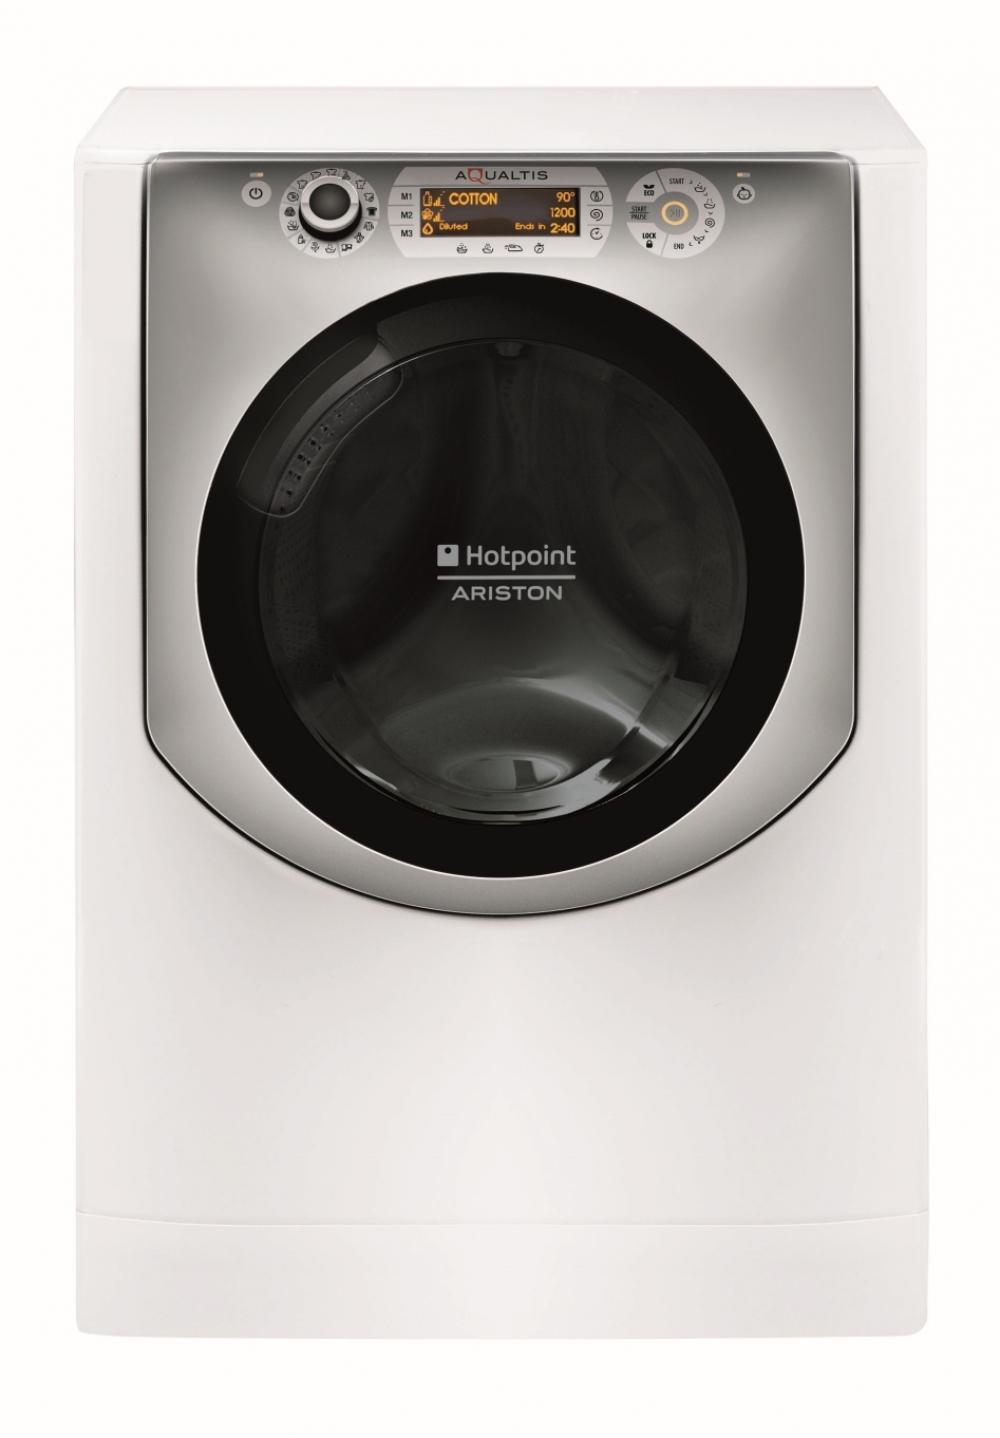 Imagine indisponibila pentru Masina de spalat rufe Hotpoint Ariston Aqualtis AQ83D 29 EU/B clasa A+++ 1200 rpm